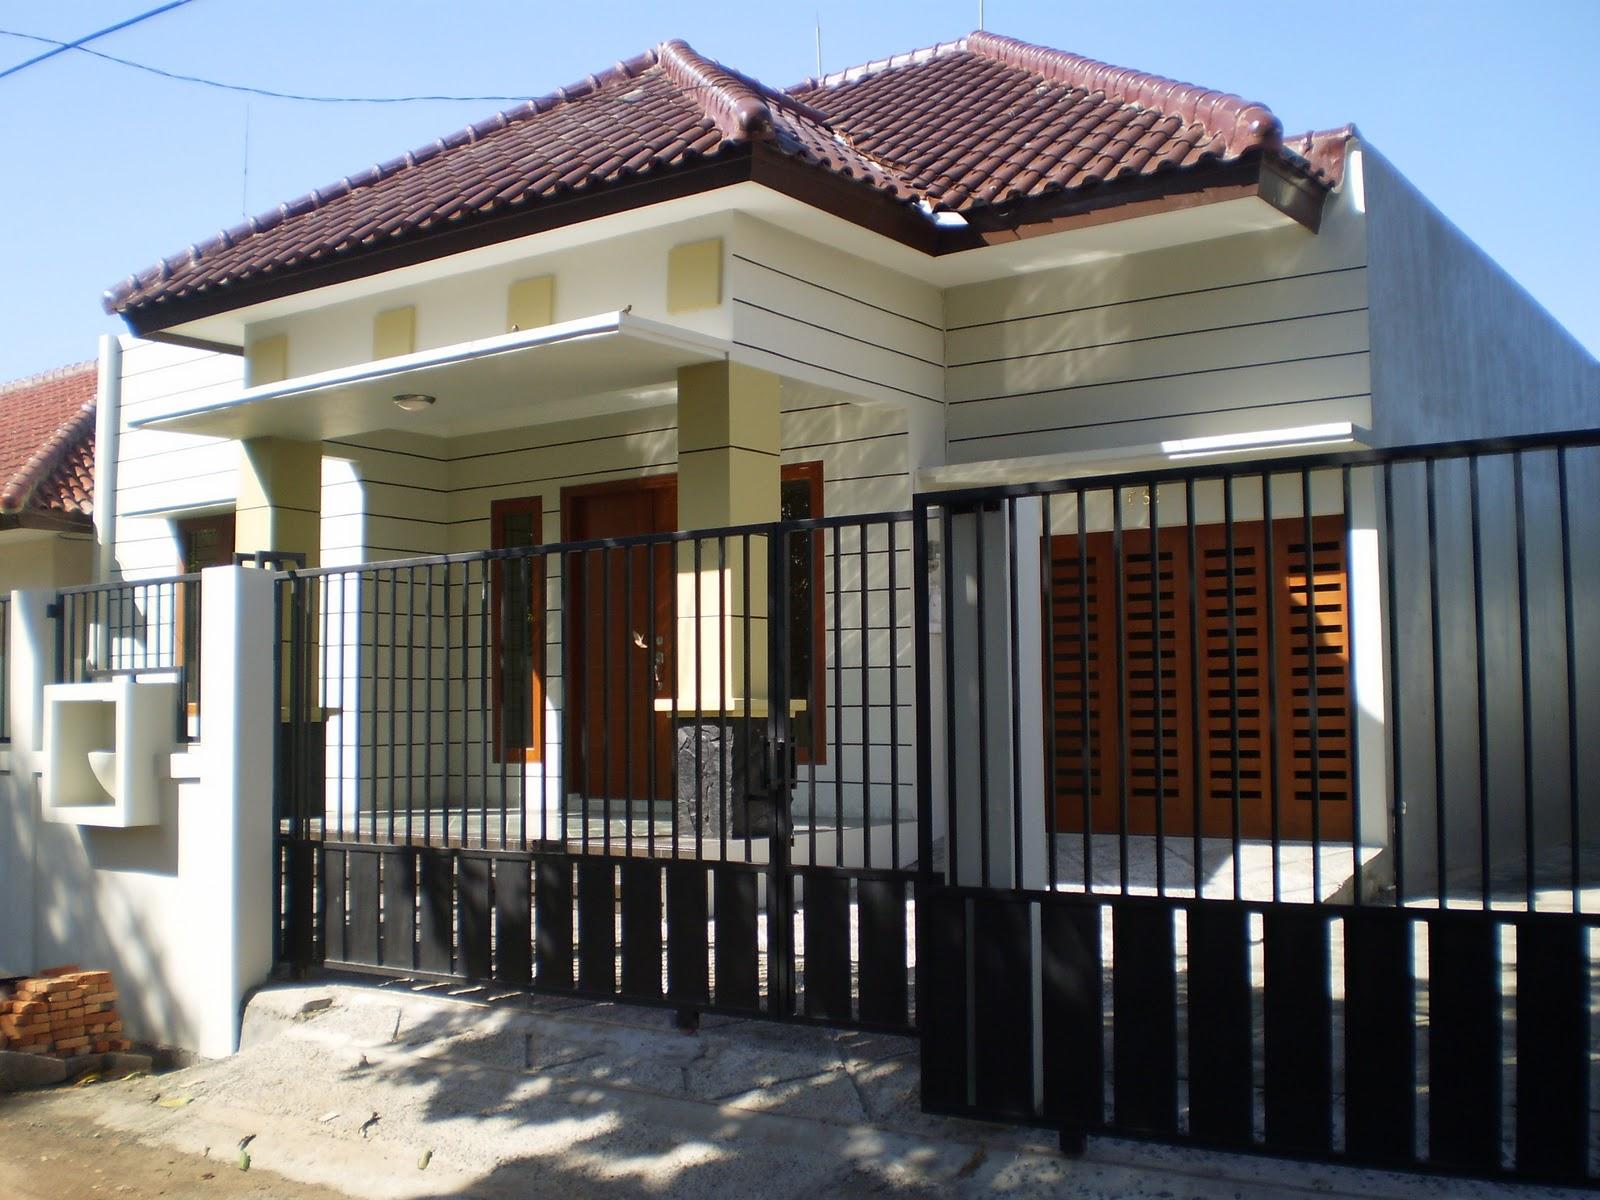 11 contoh gambar pagar untuk rumah minimalis gambar